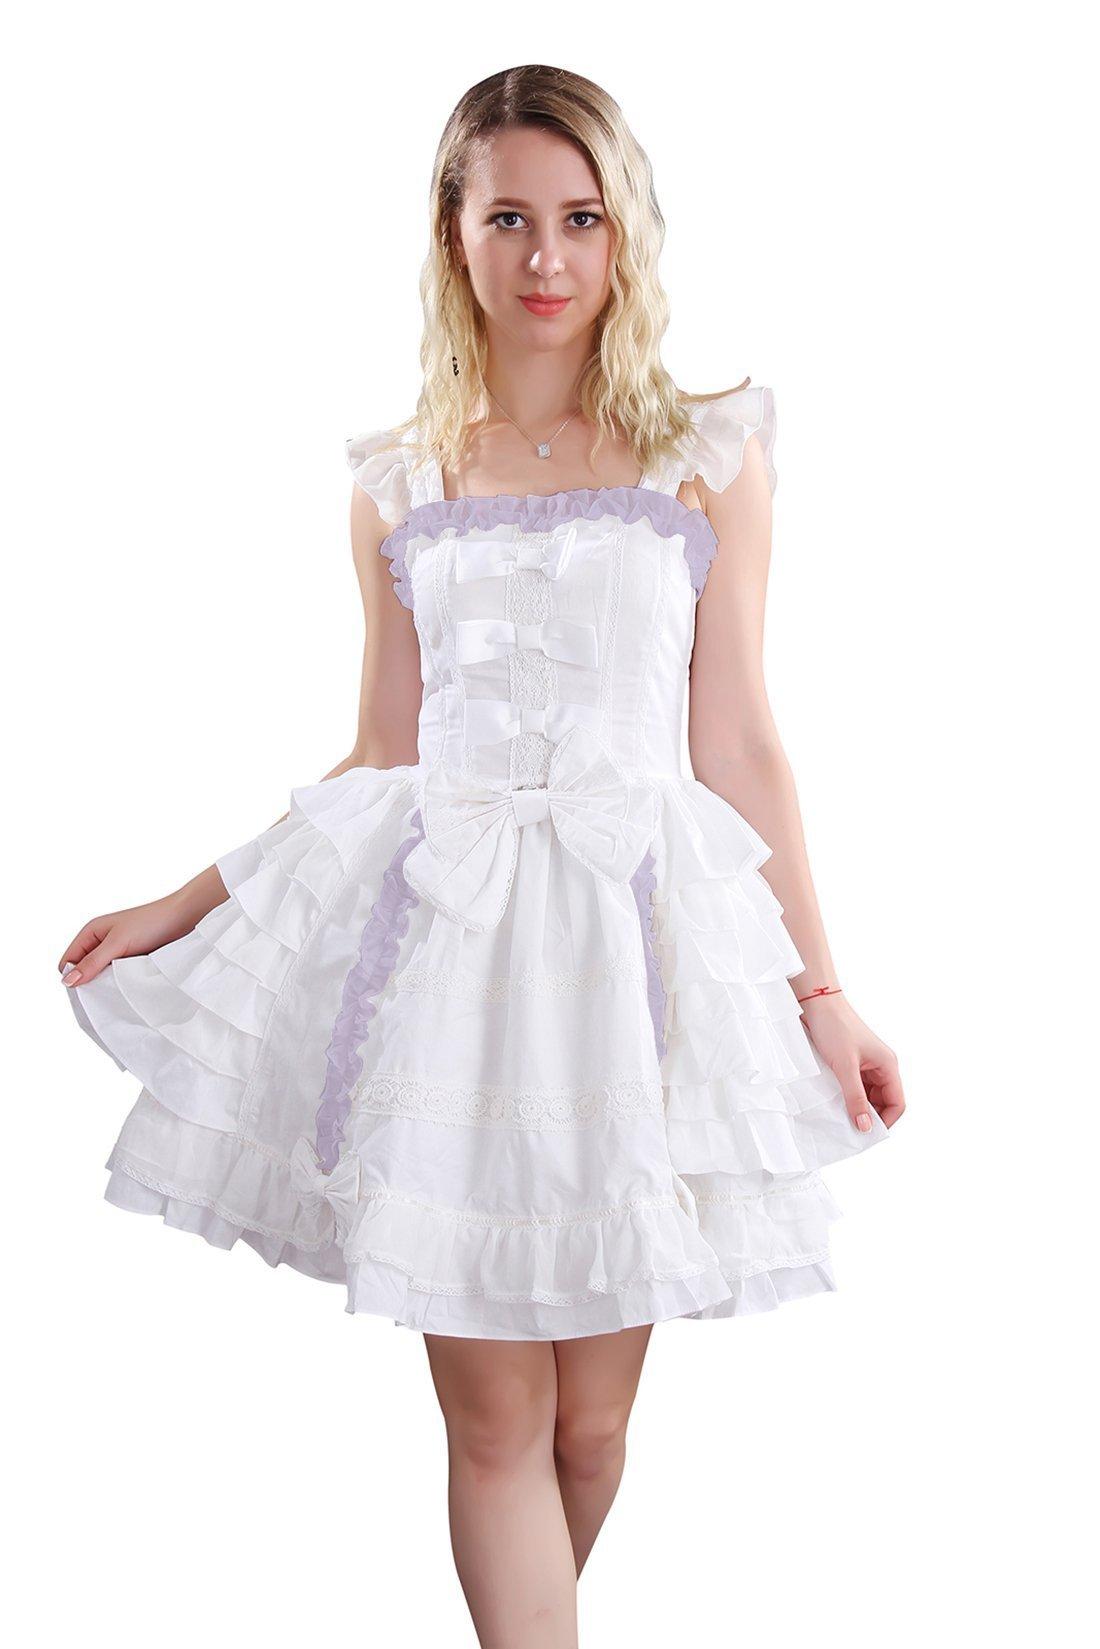 Nuoqi Court Lolita Dress White Lace Cosplay Princess Dress L Size CC220H-L